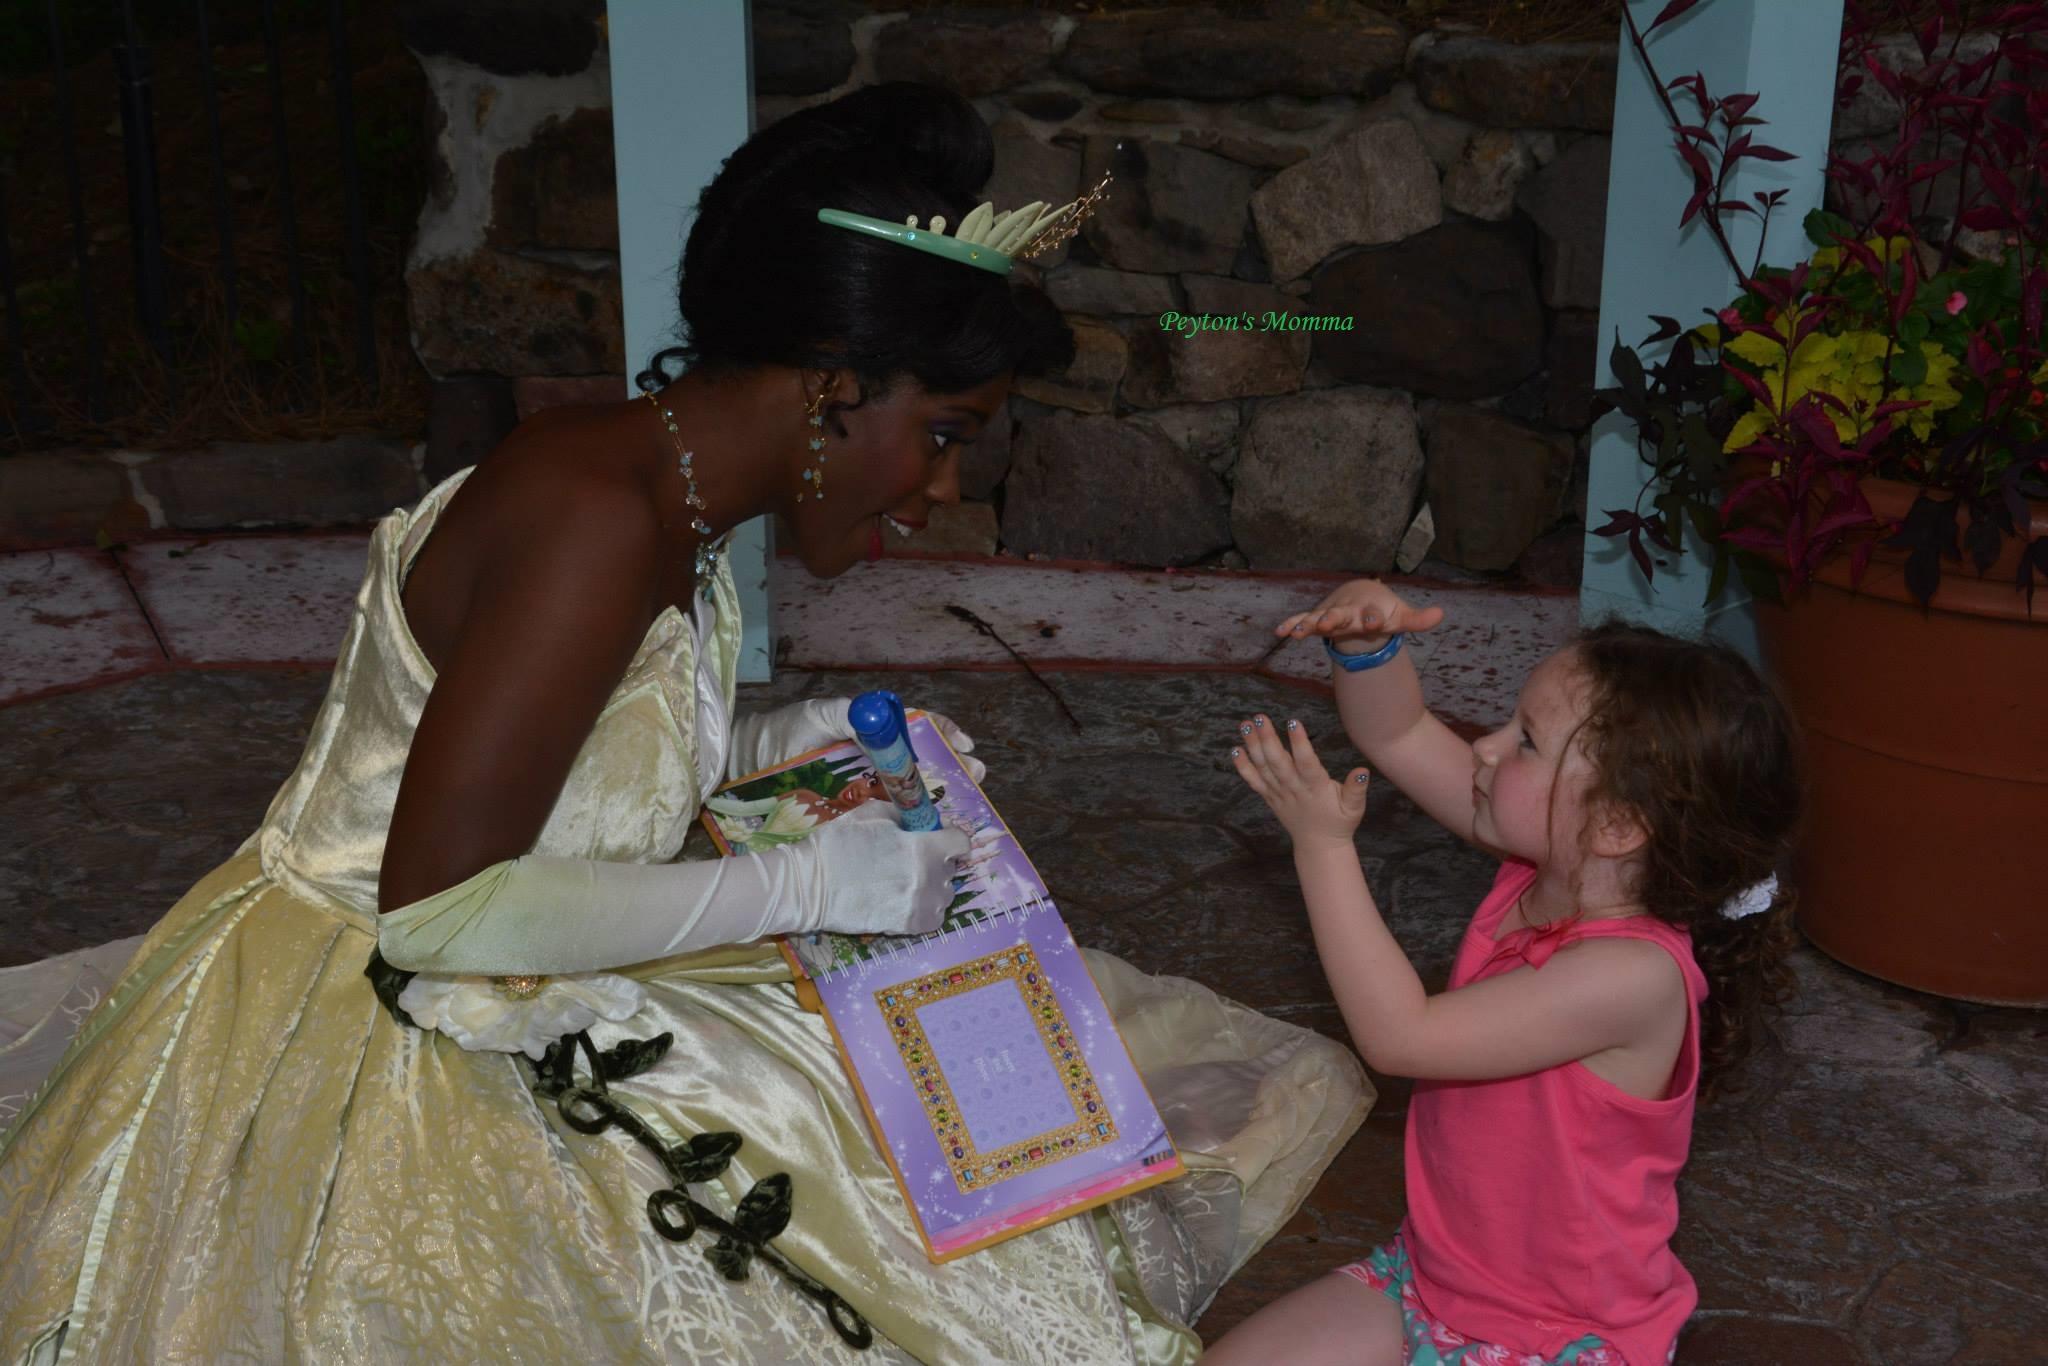 Peyton telling stories to Tiana